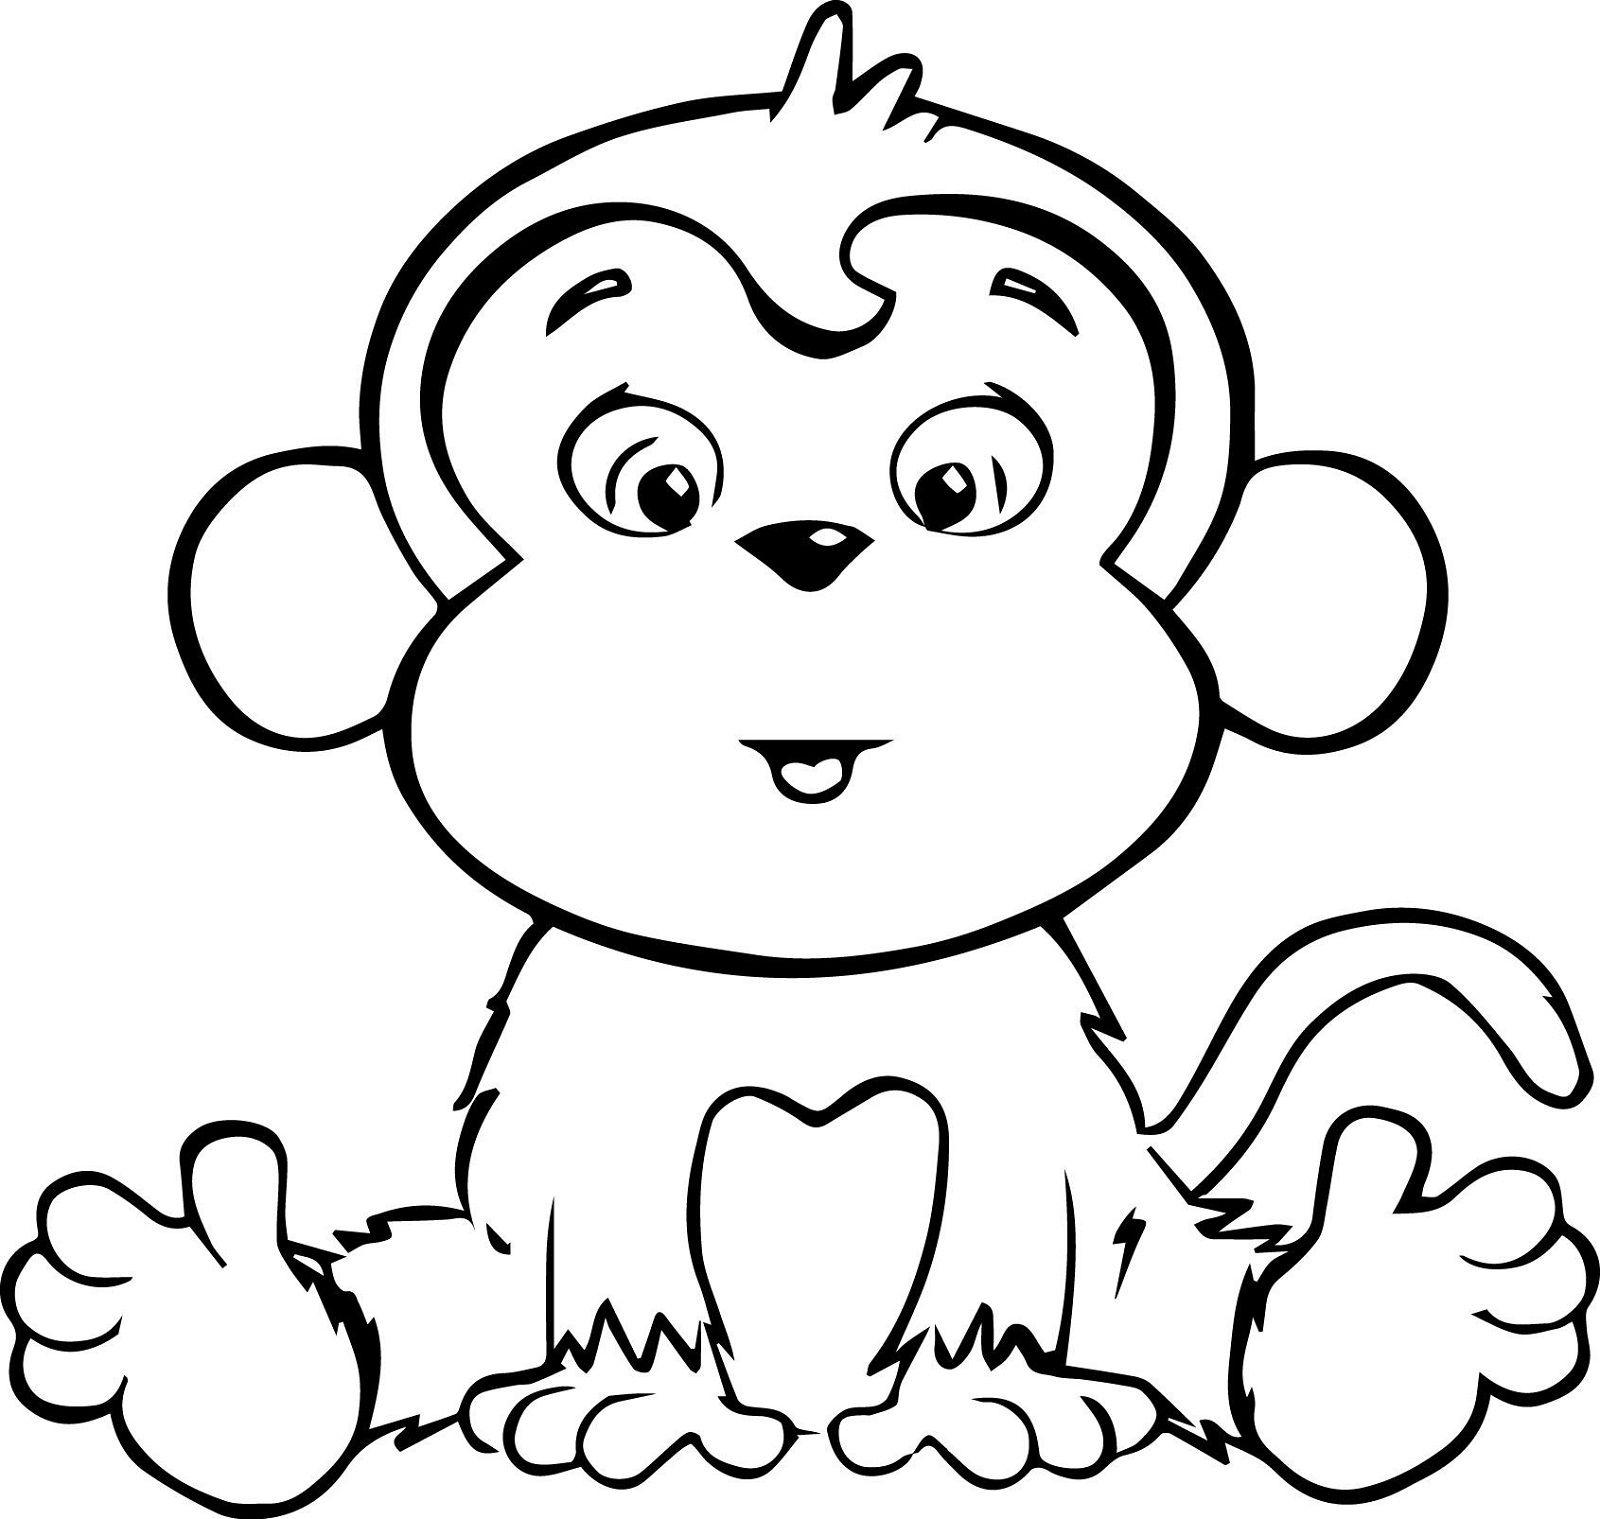 Monkeys Coloring Pages Worksheets Loving Printable Monkey